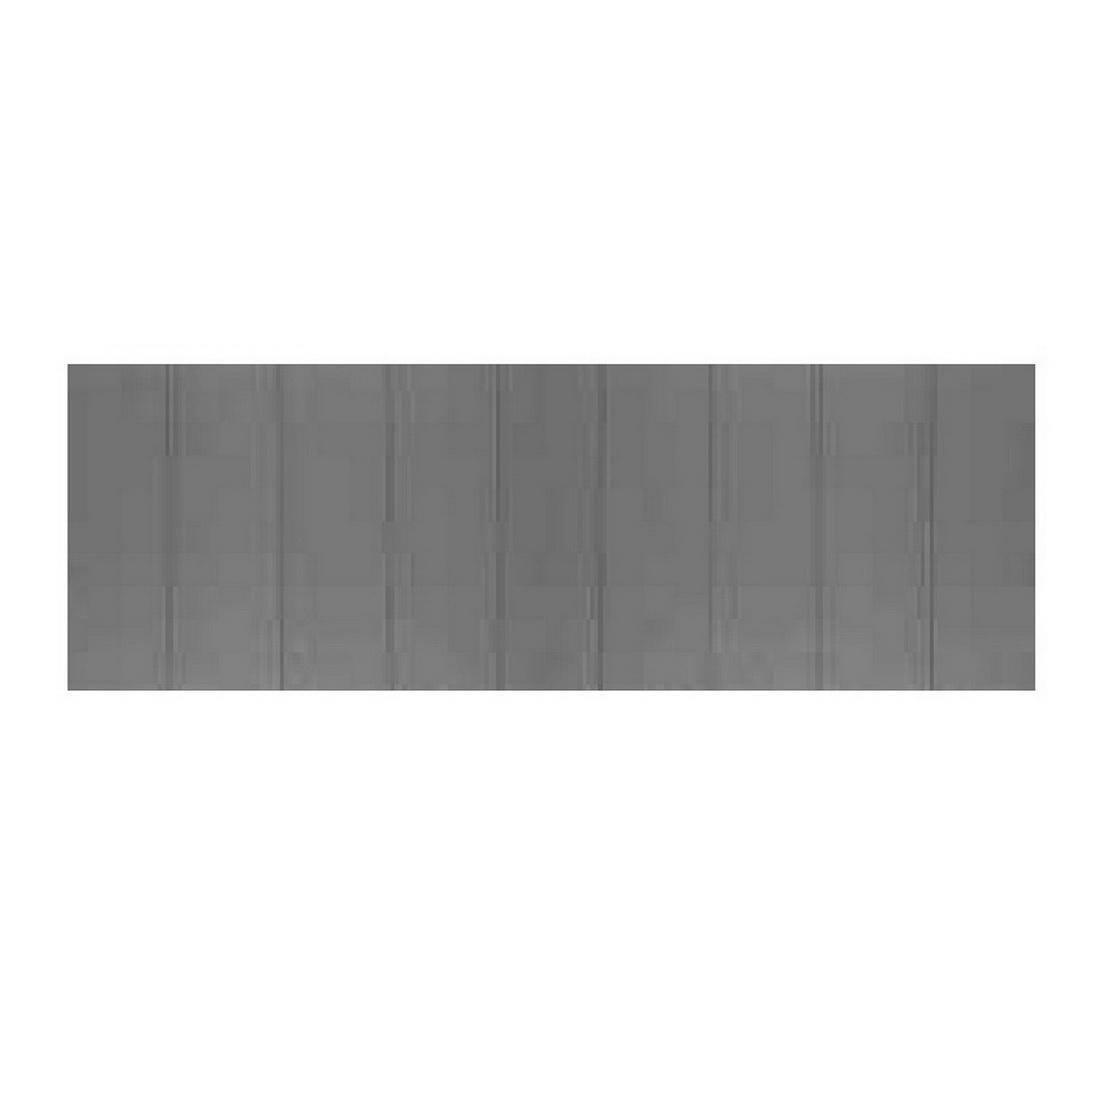 Axon Panel 133mm Grained 2750 x 1200 x 9mm